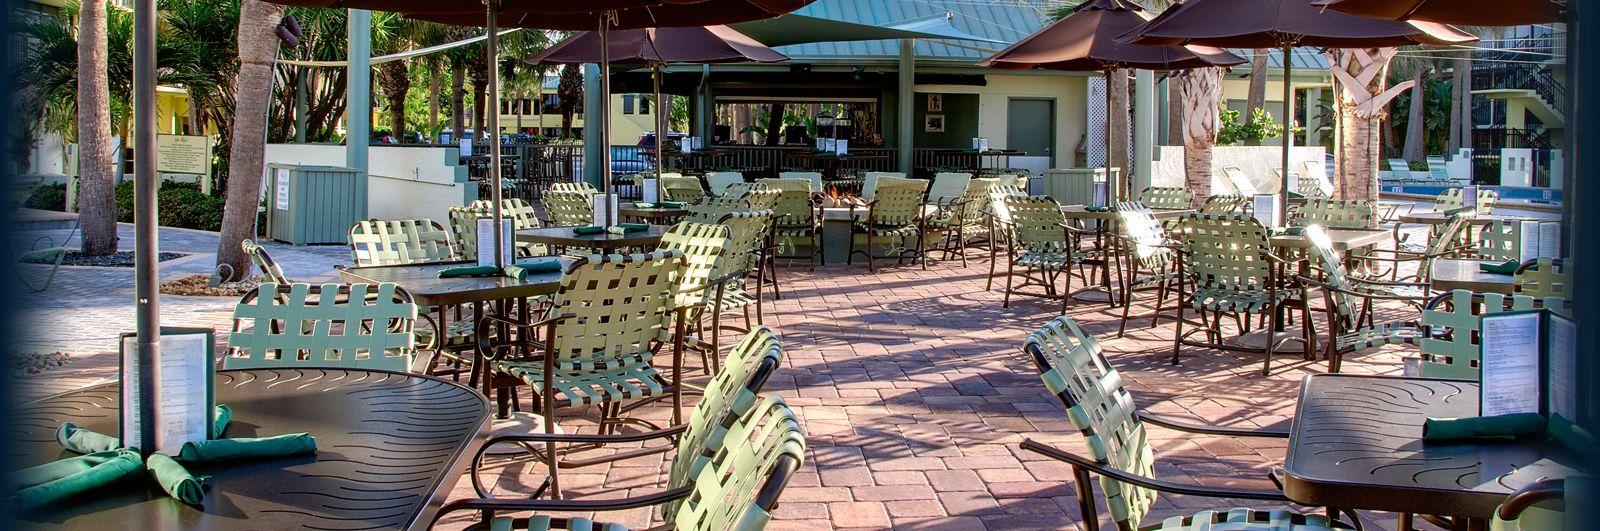 St Pete Beach Restaurants And Bars Harrys Beach Bar At Sirata